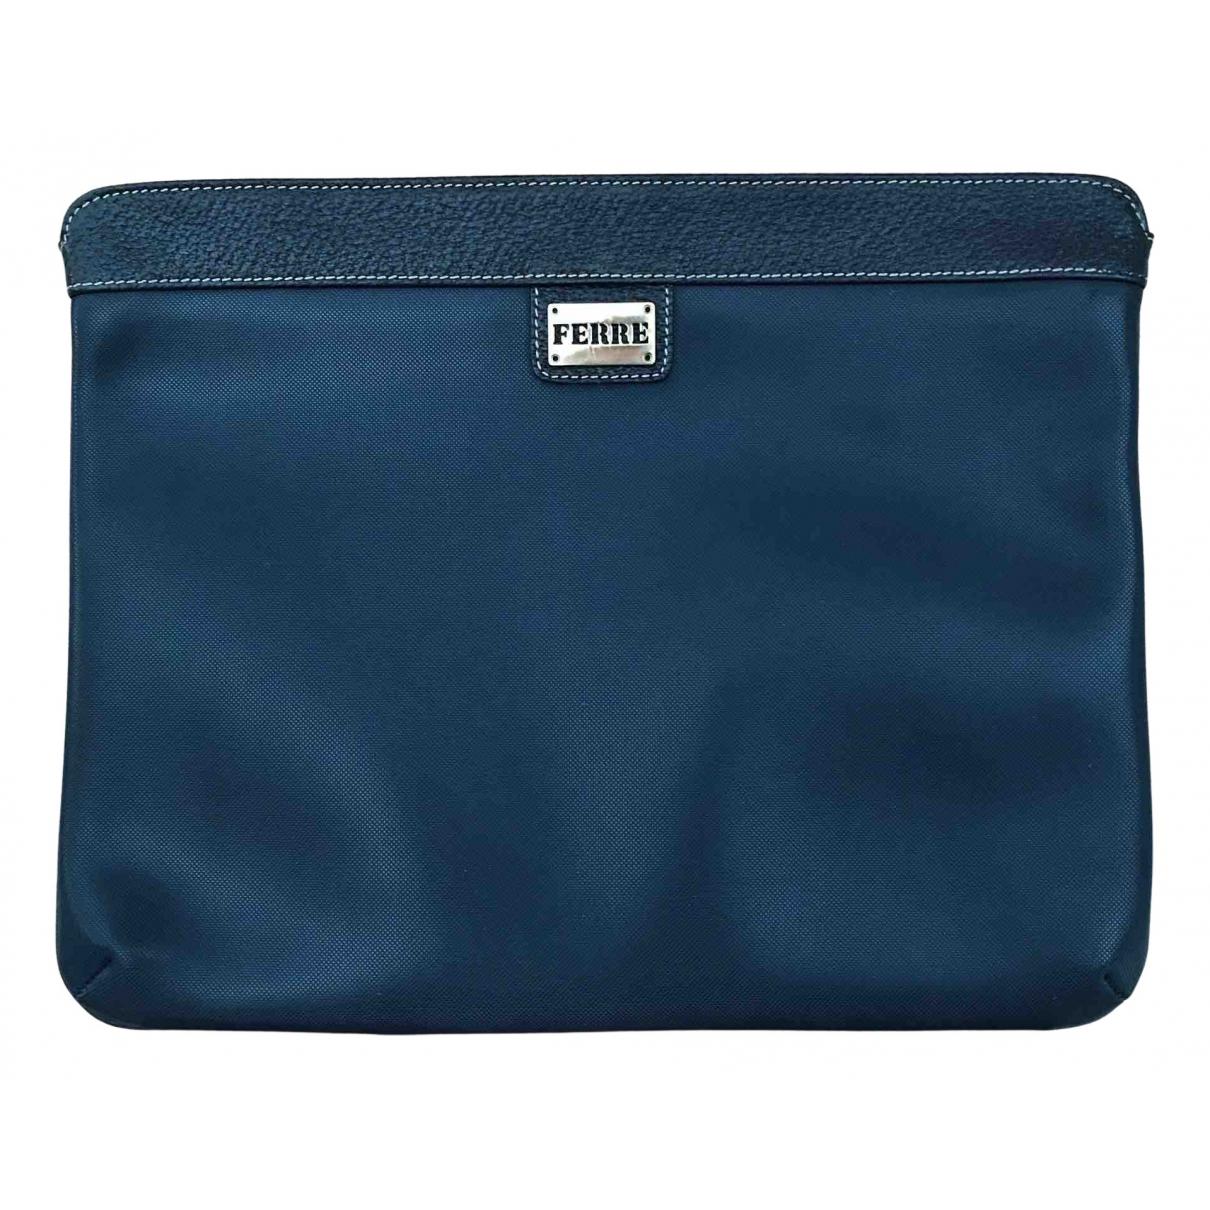 Gianfranco Ferré N Blue Clutch bag for Women N